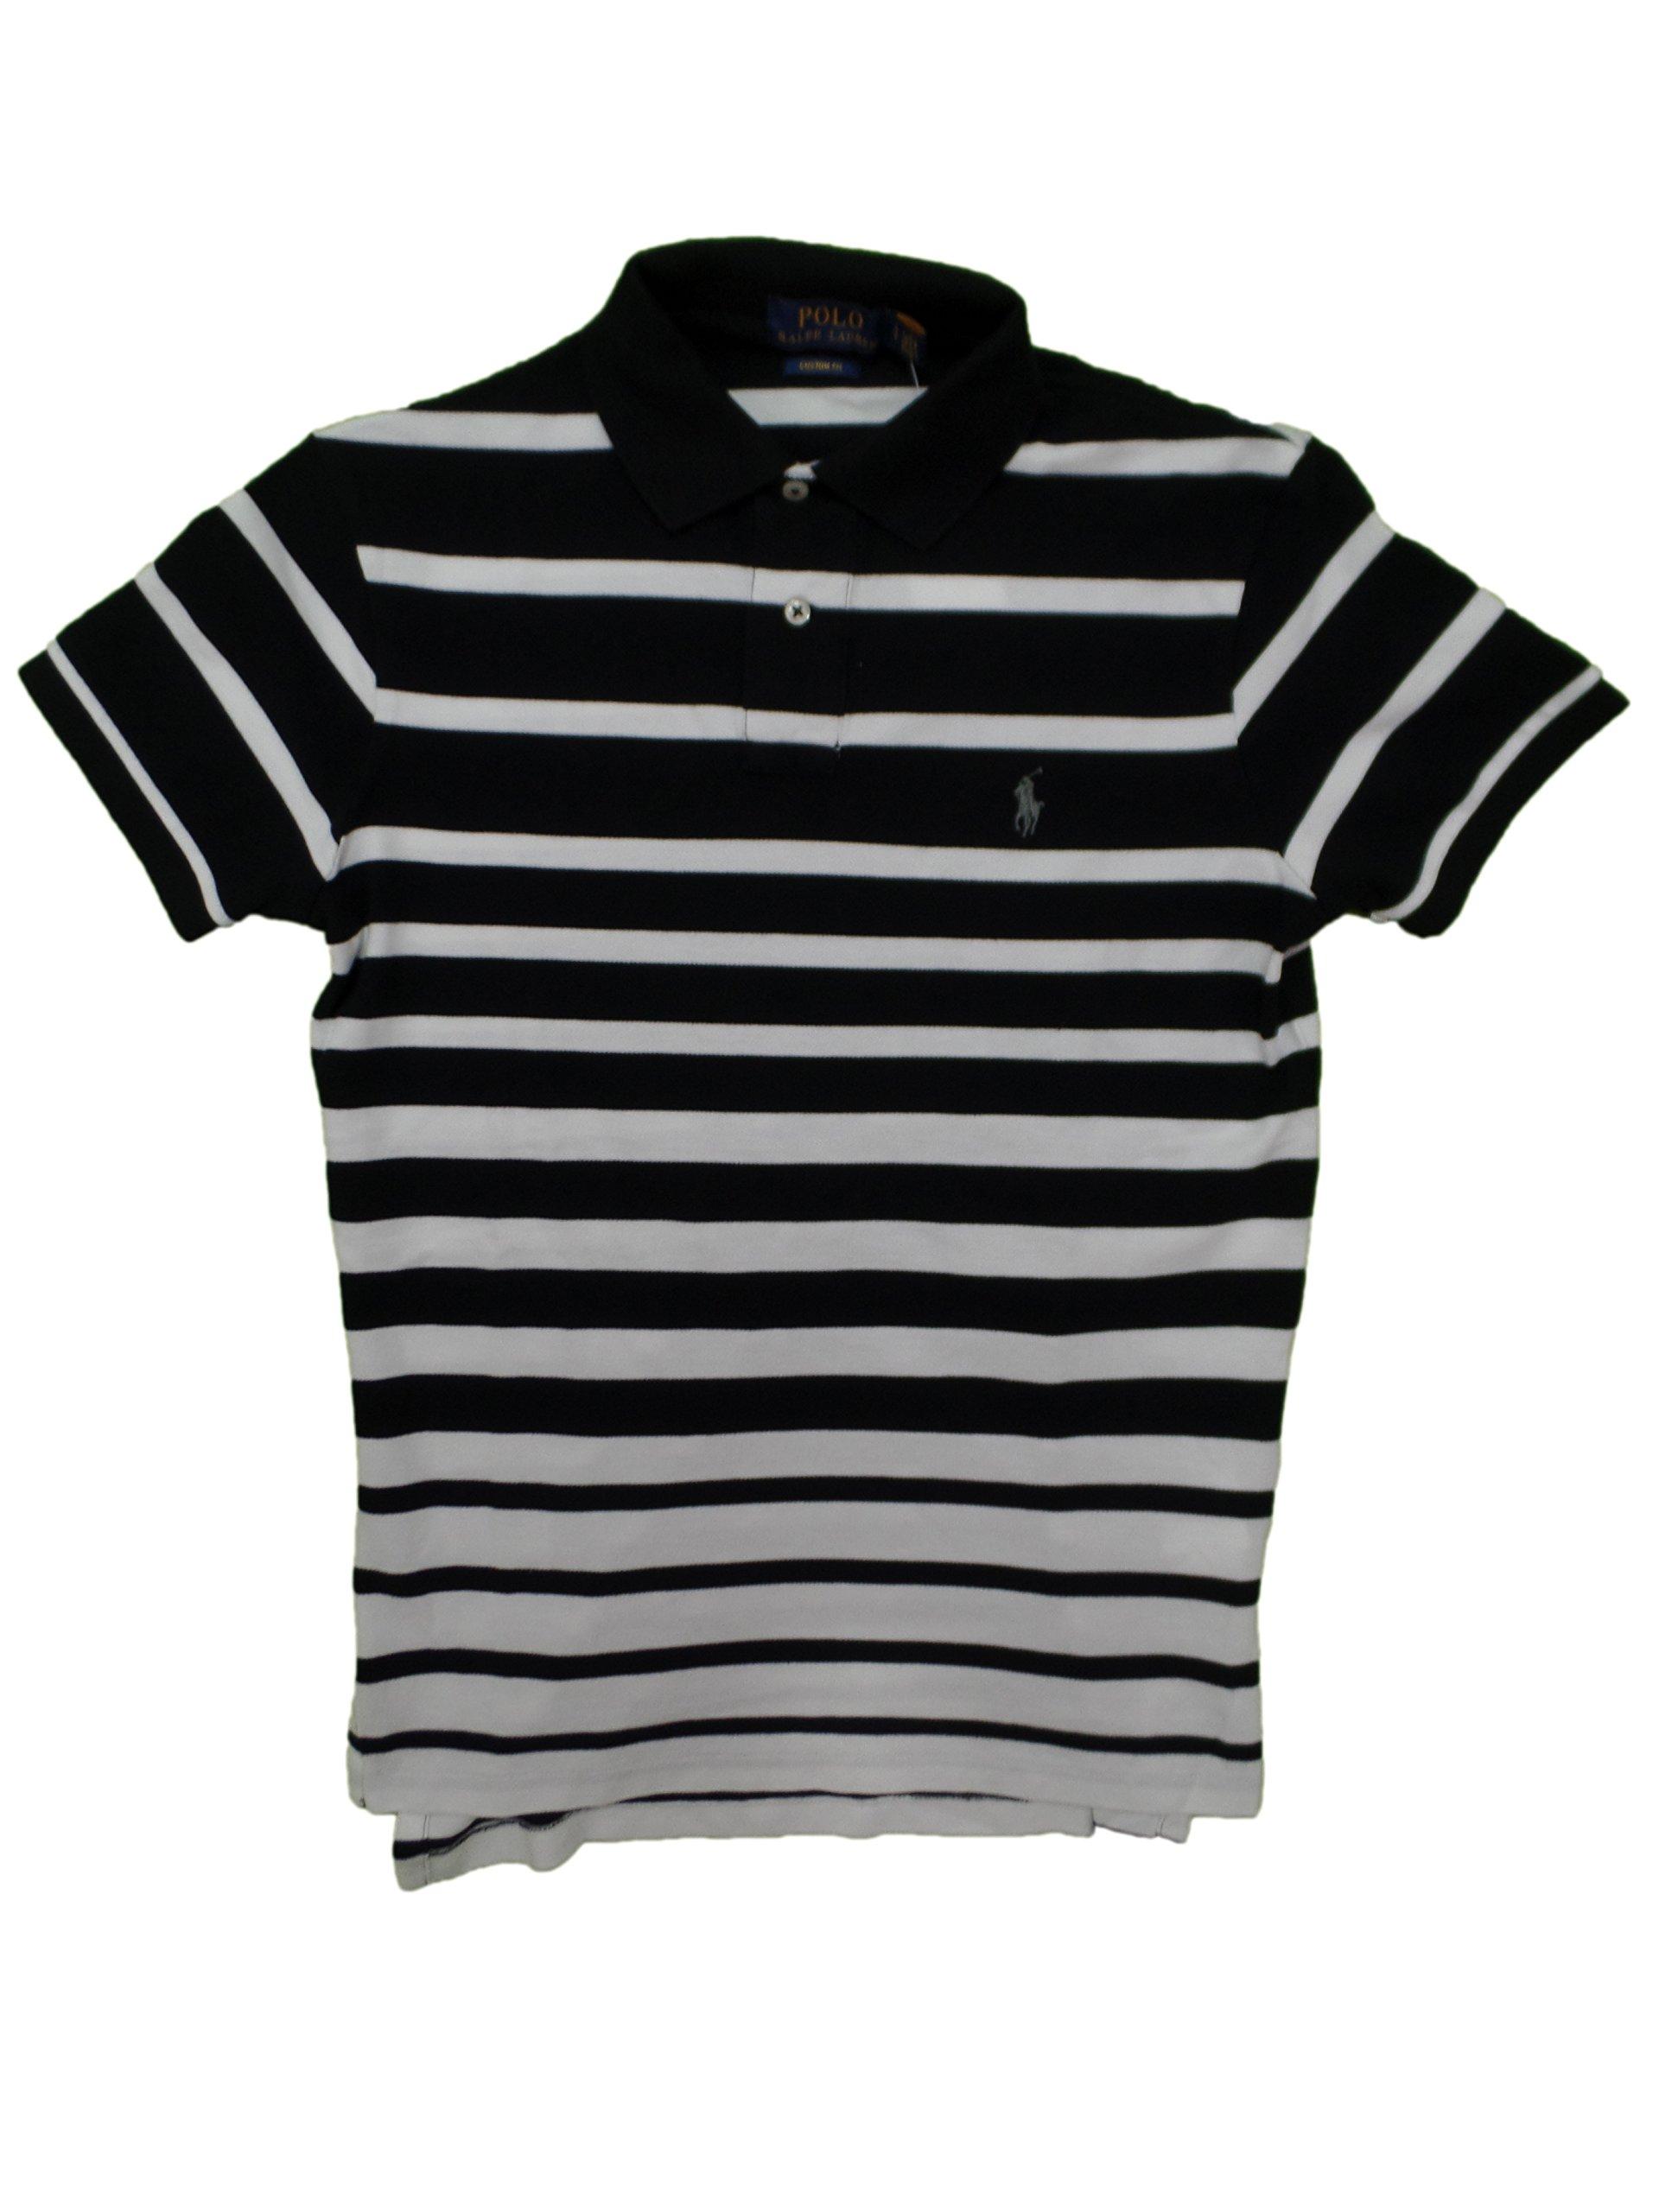 b44aee09b Galleon - Polo Ralph Lauren Men's Striped Polo Shirt Custom Fit (S, Polo  Black)